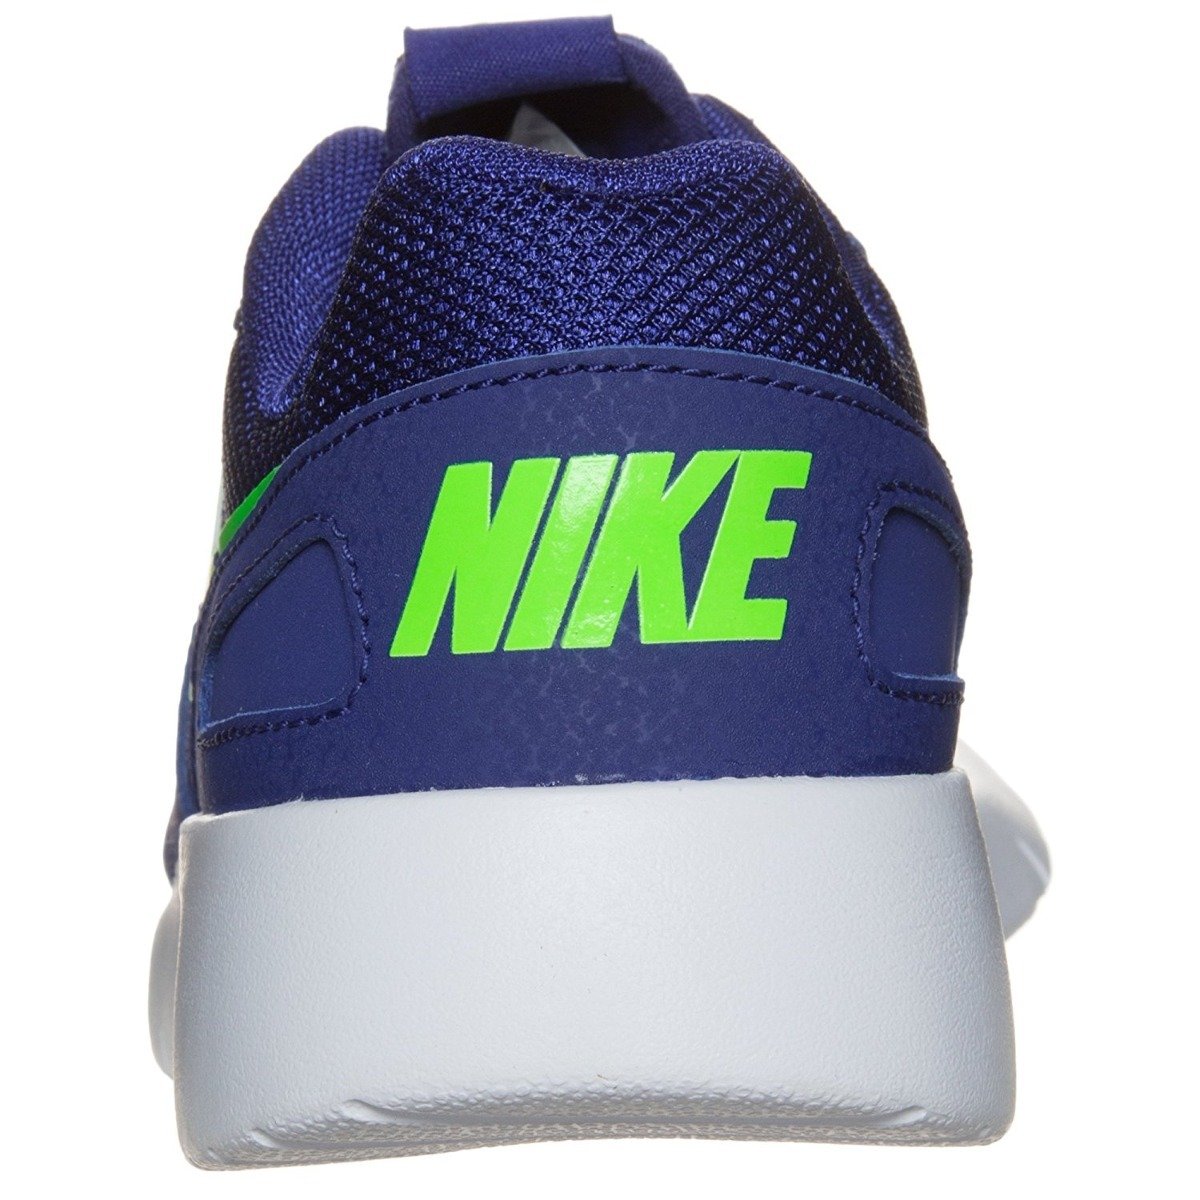 f81f175bedf Tenis Nike Kaishi Azul Infantil Running -   899.00 en Mercado Libre